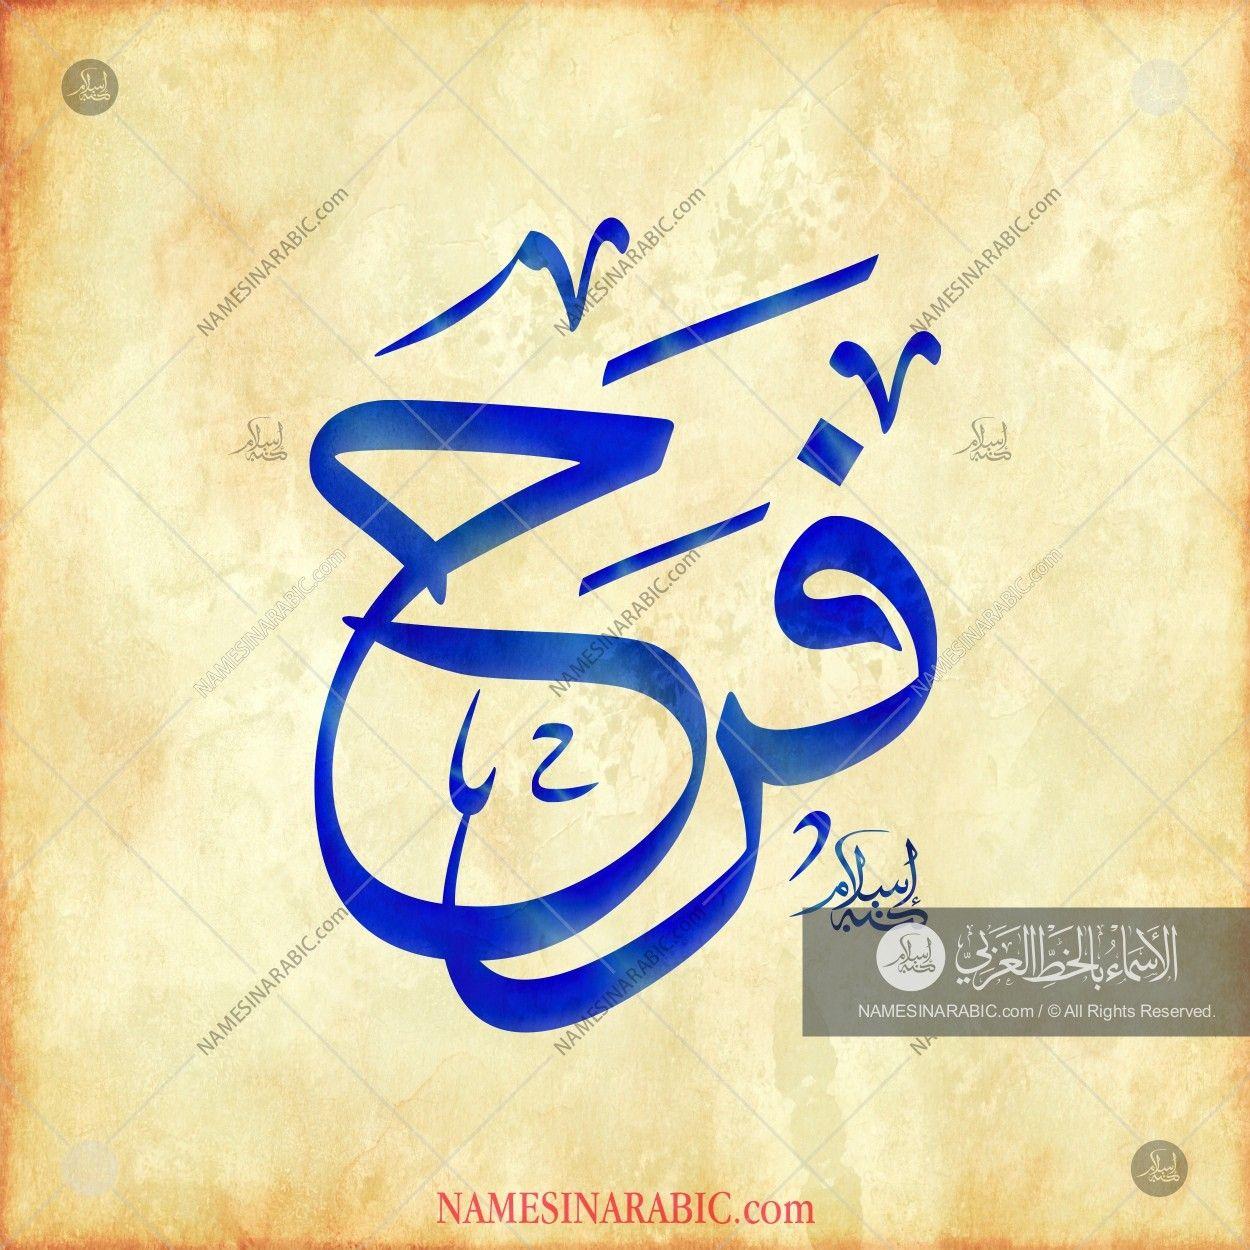 Farah Name In Arabic Calligraphy Islamic Calligraphy Painting Arabic Calligraphy Art Calligraphy Words